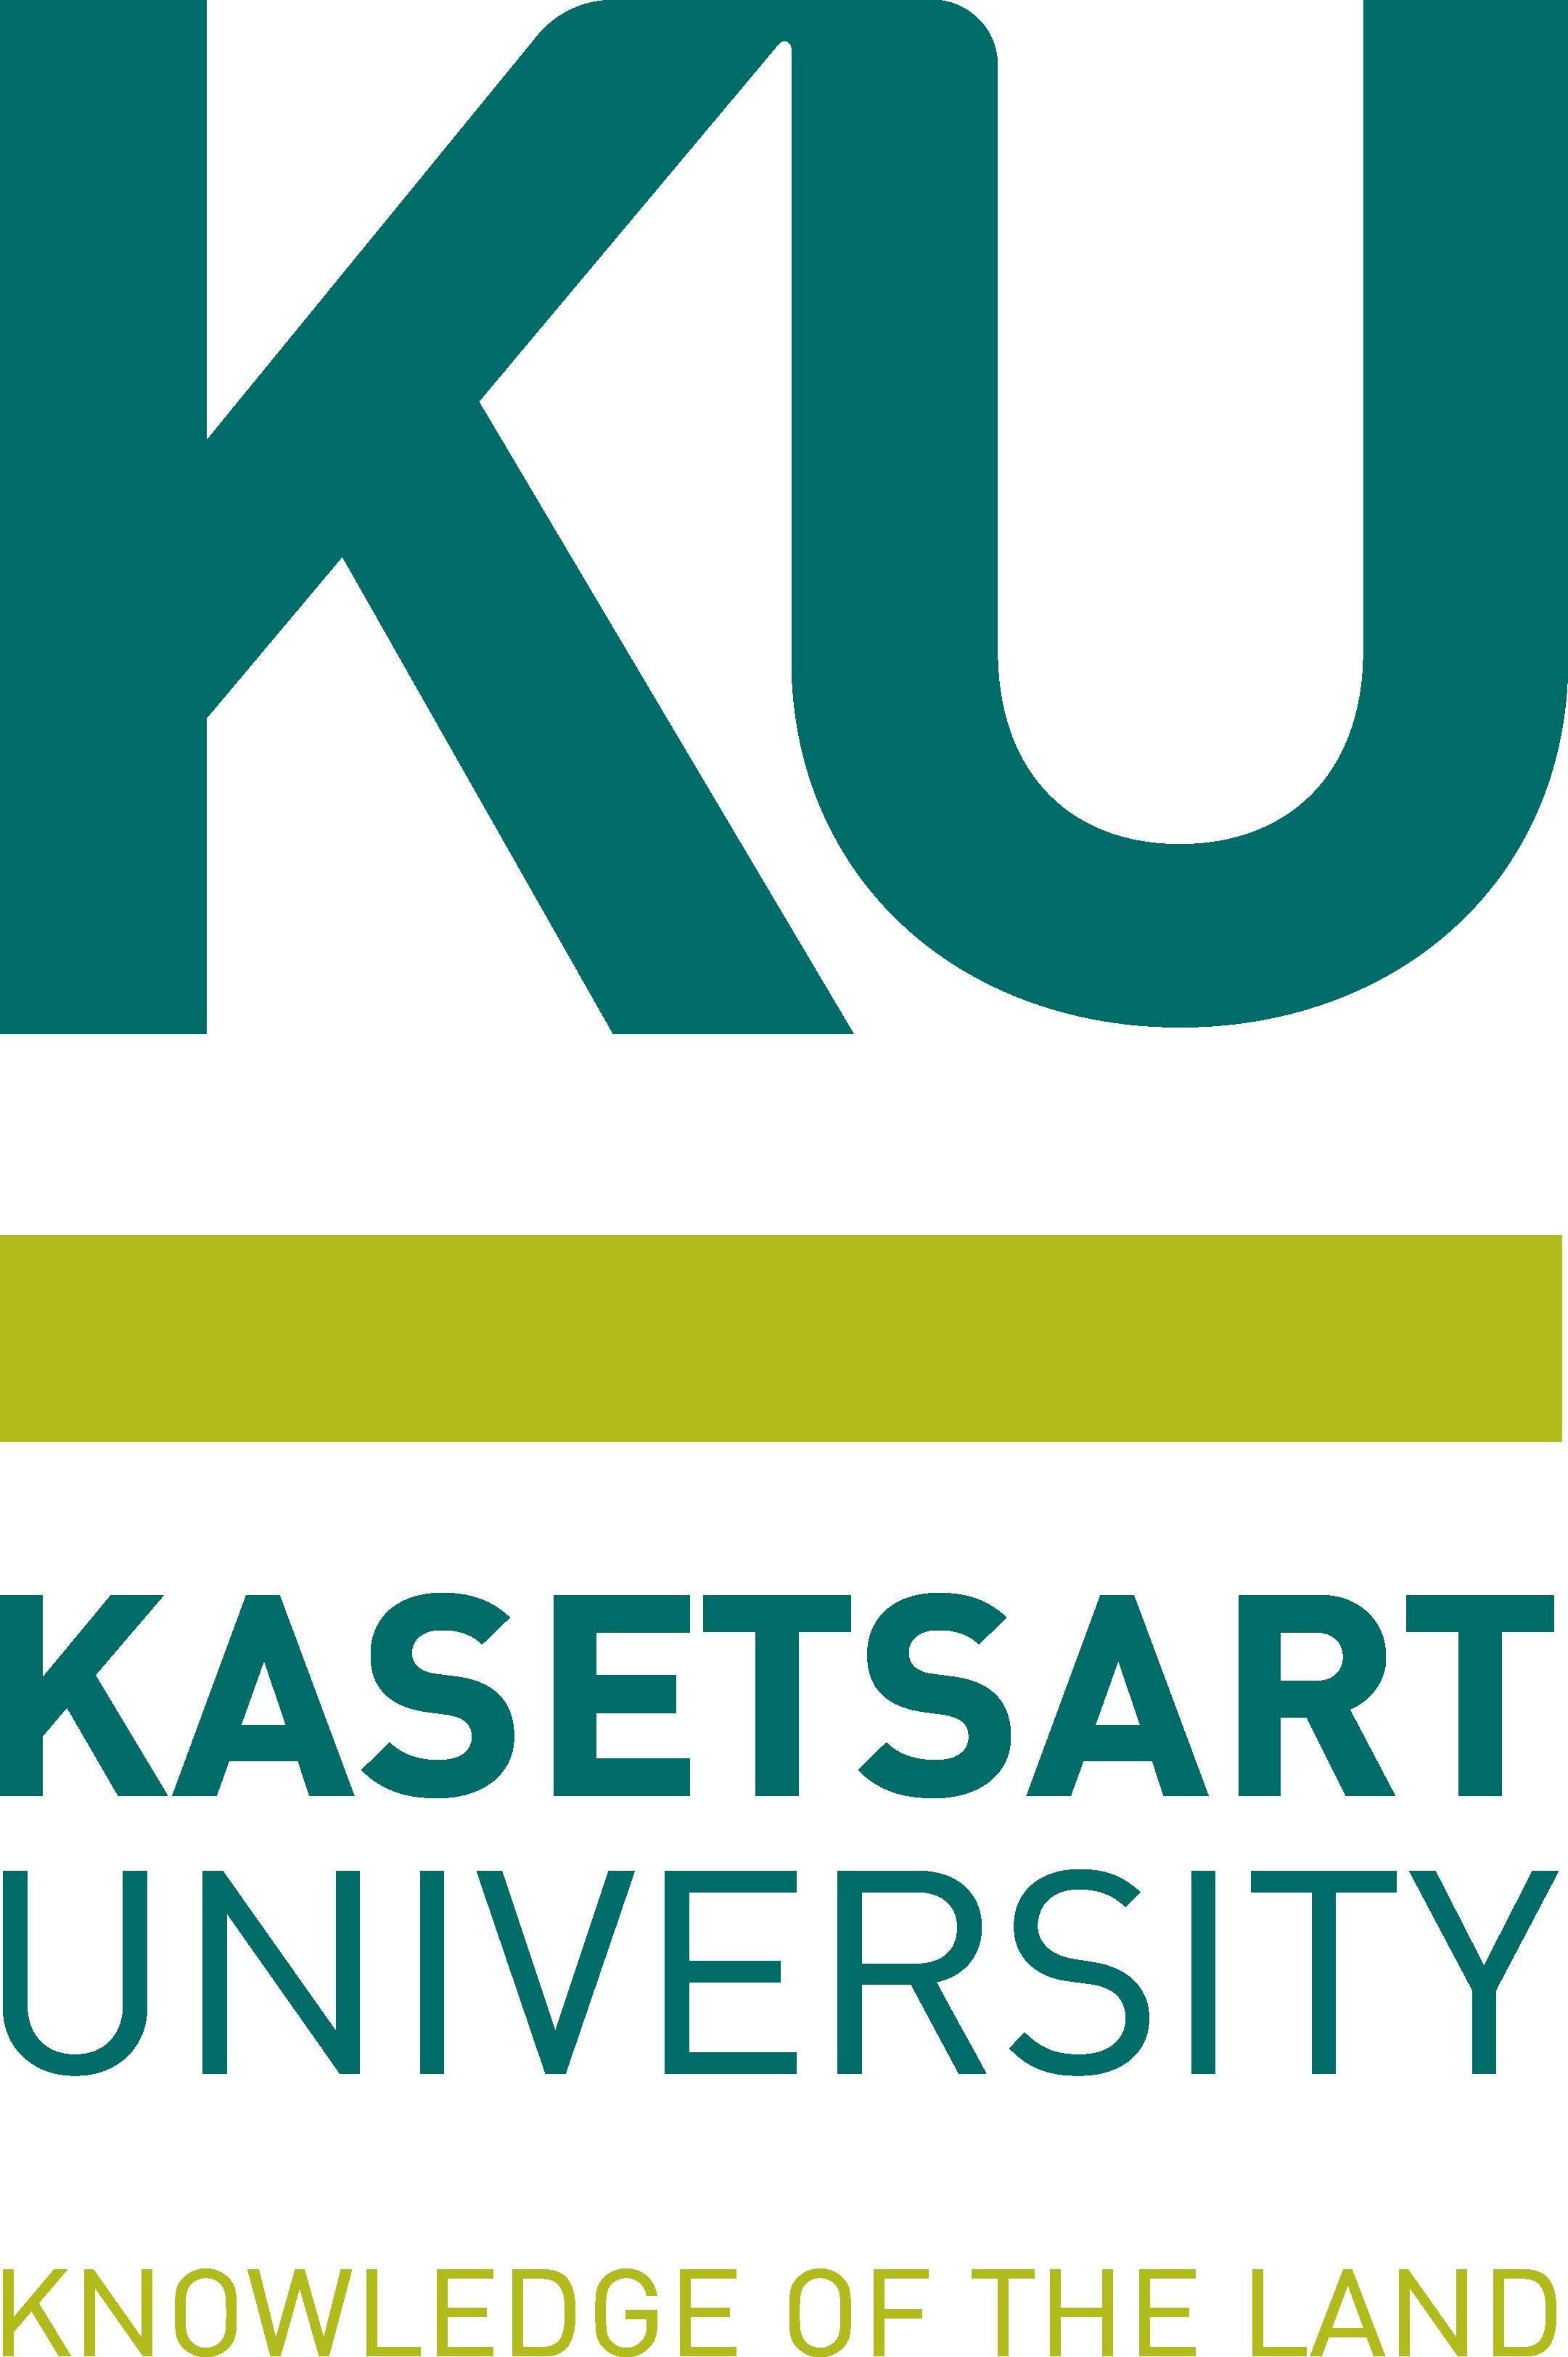 KU11-4